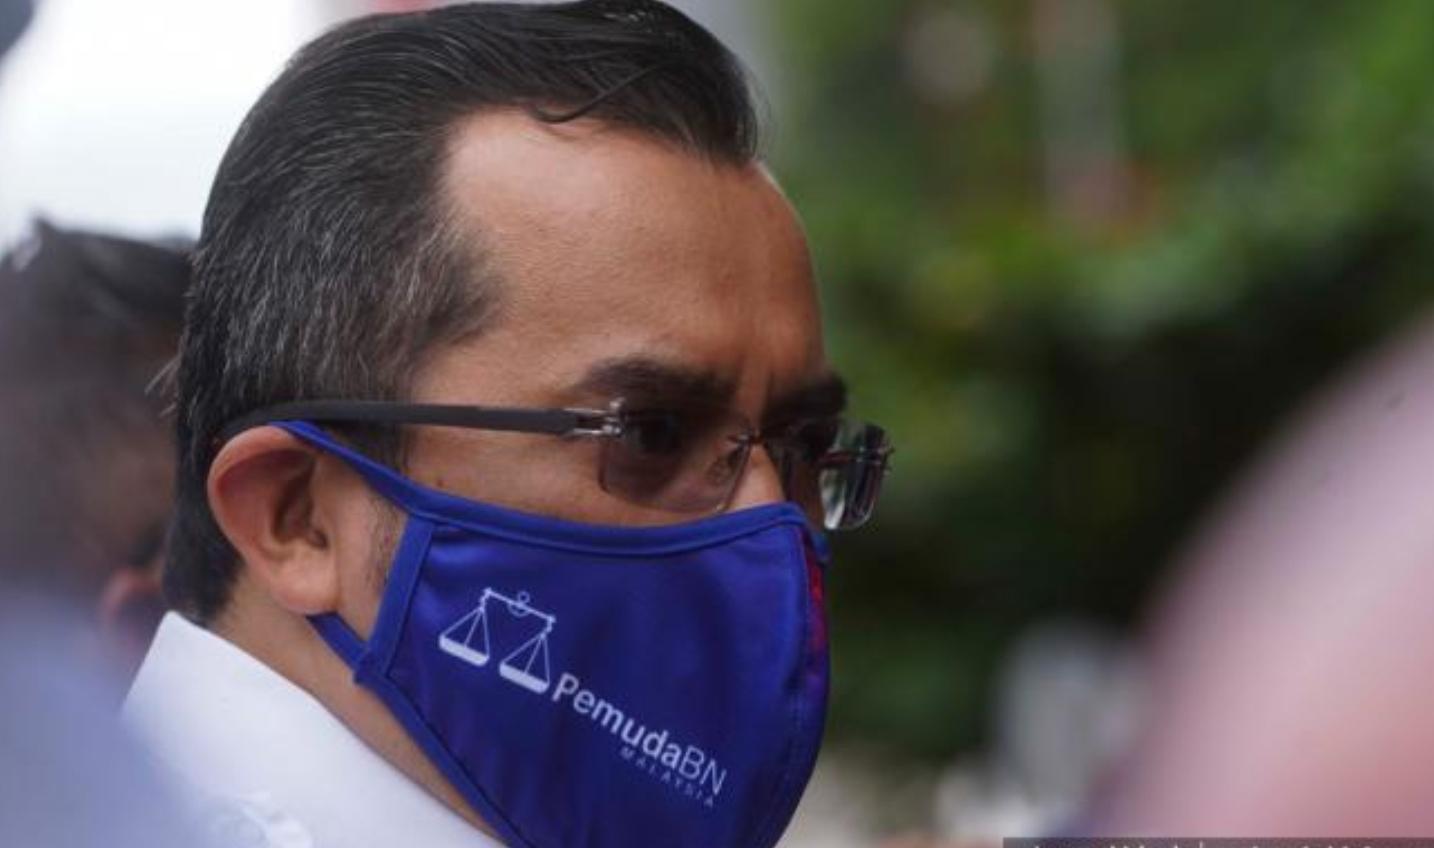 Lengah buka parlimen tanda derhaka, kata Pemuda Umno